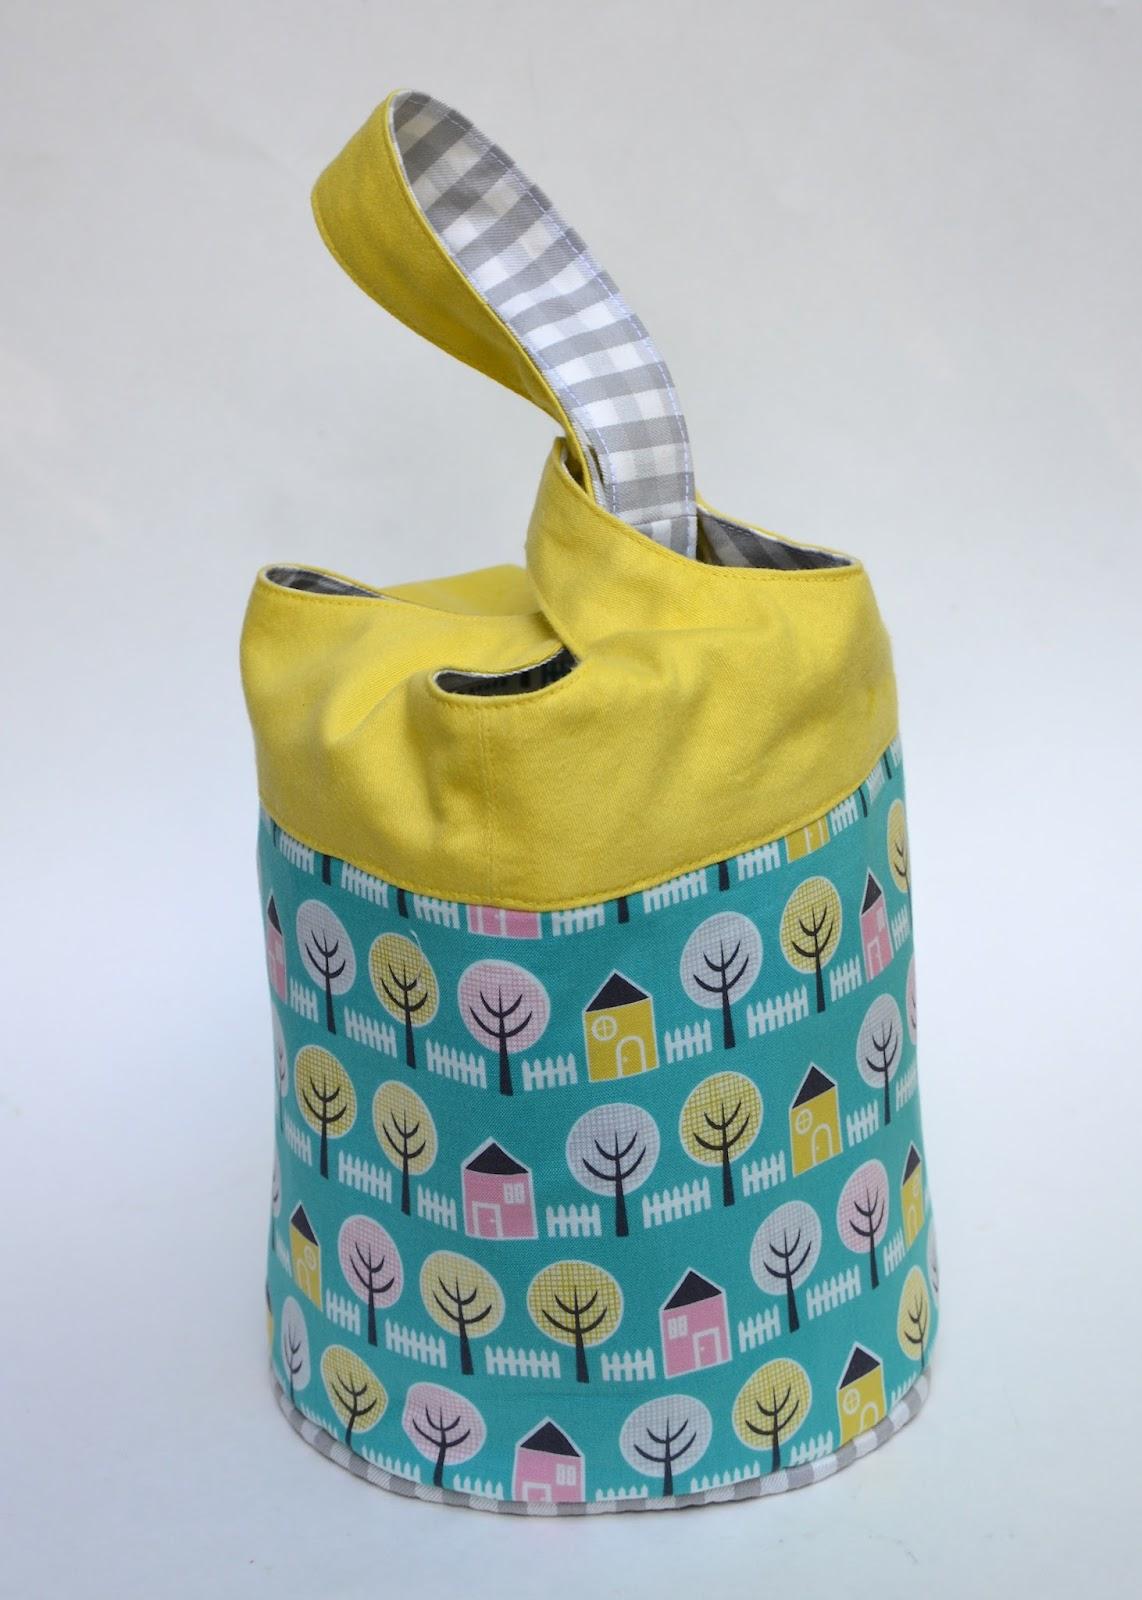 Ikat bag my cloverleaf tutorial at sew mama